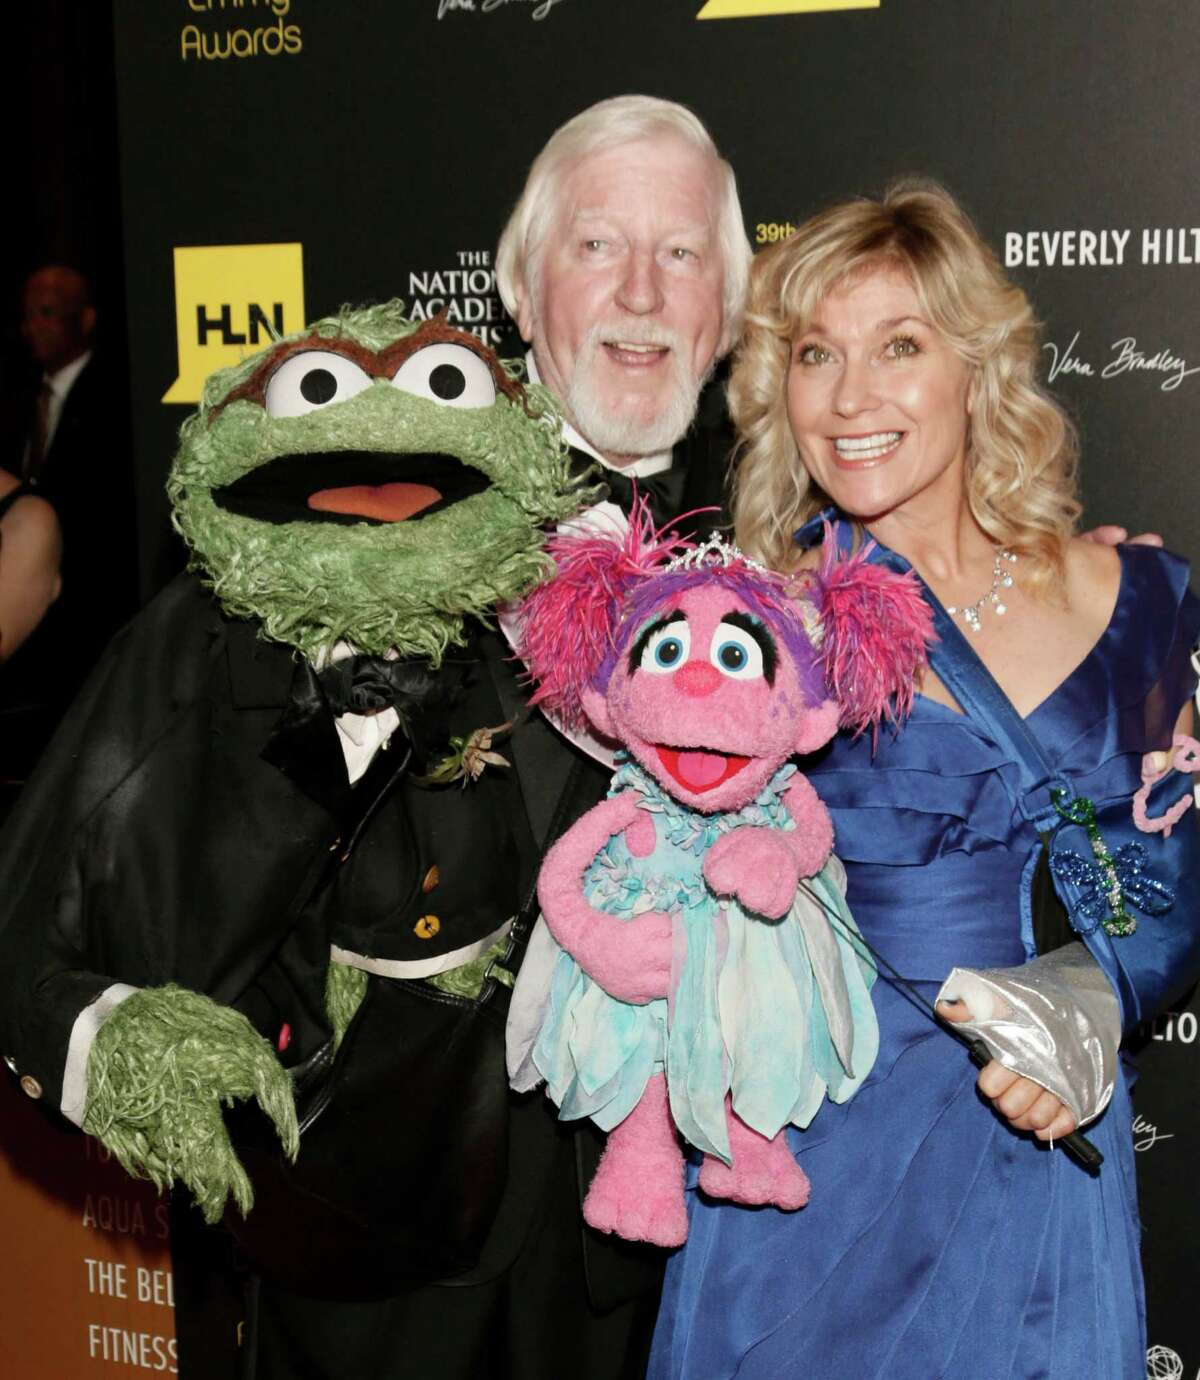 Caroll Spinney, left, and Leslie Carrara Rudolph pose with puppets Oscar the Grouch, left, and Abby Cadabby.